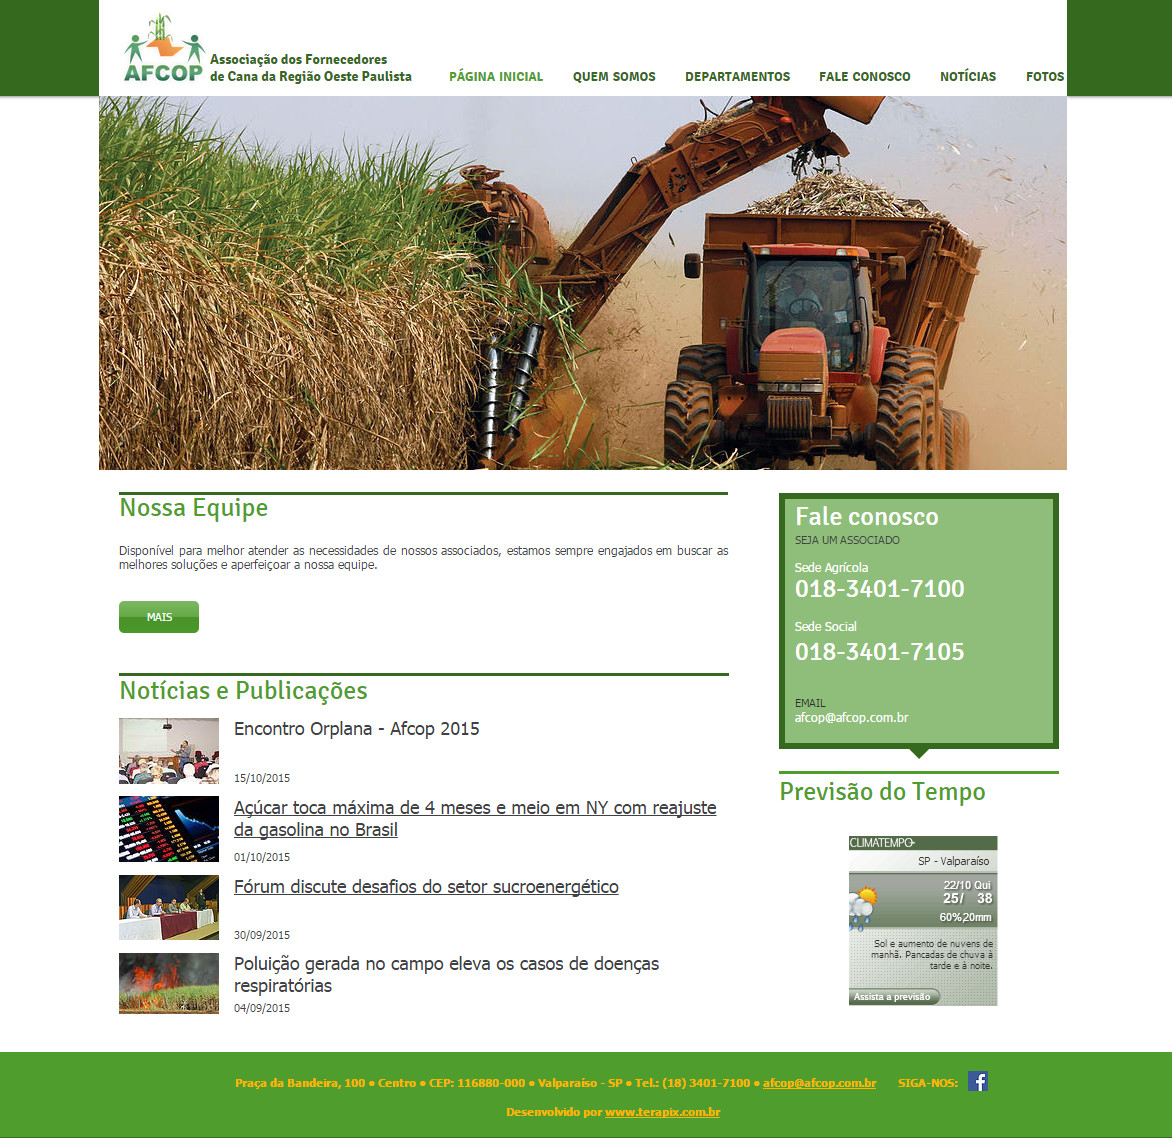 Portal da AFCOP